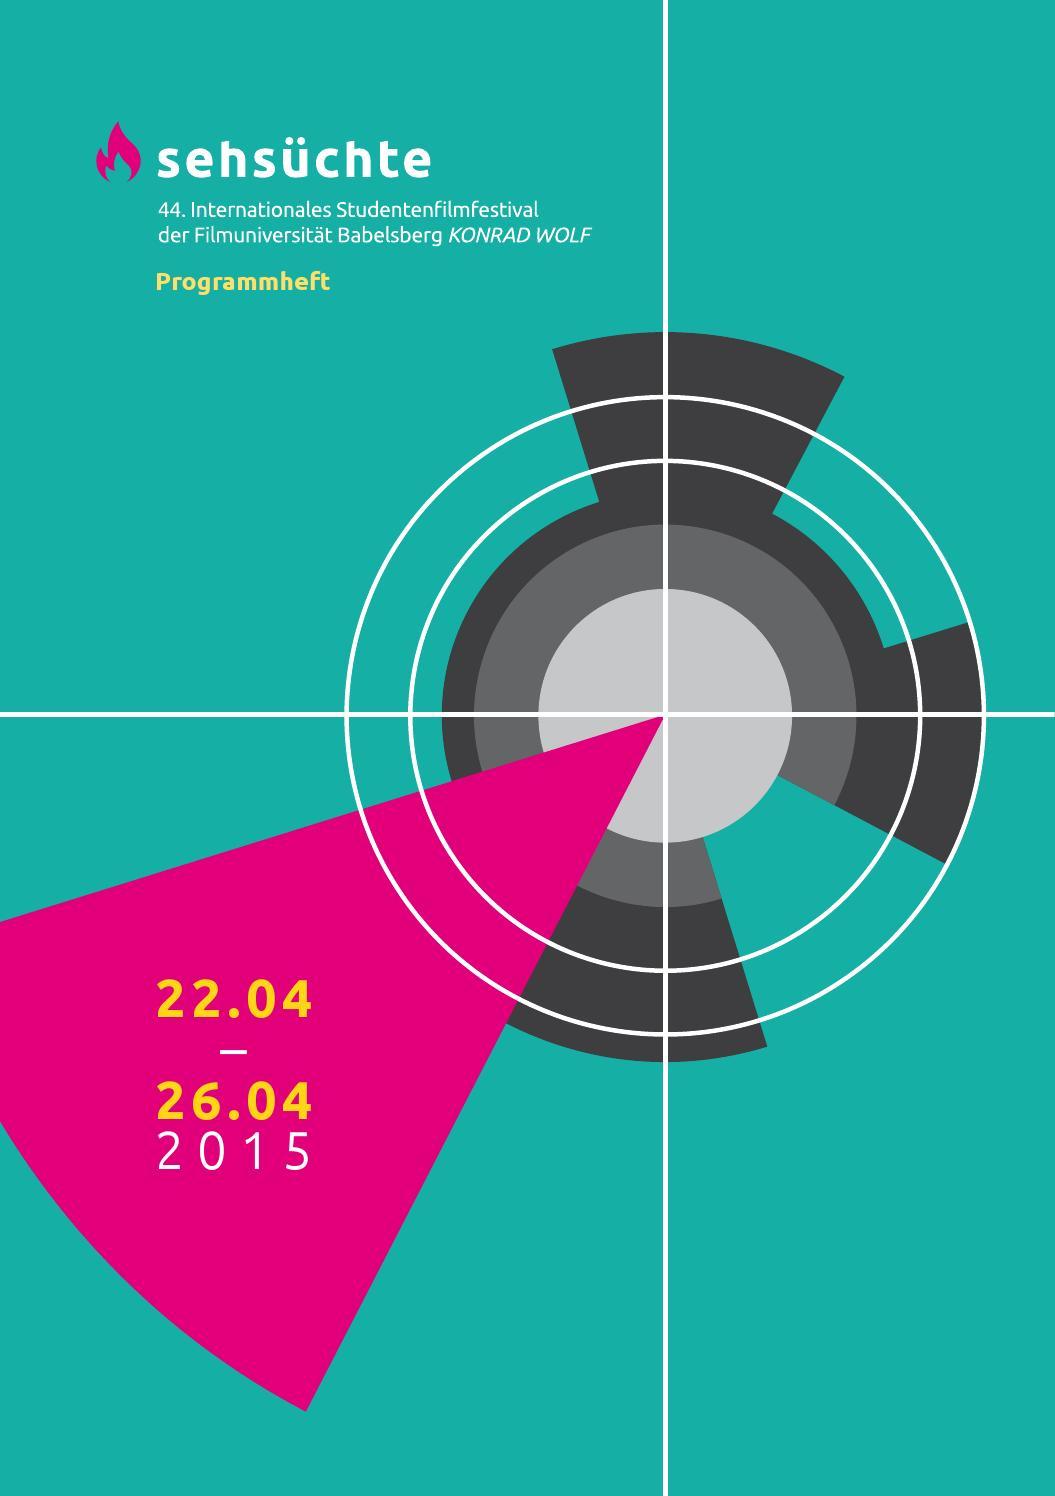 Sehsüchte Program 2015 by Sehsüchte - issuu on